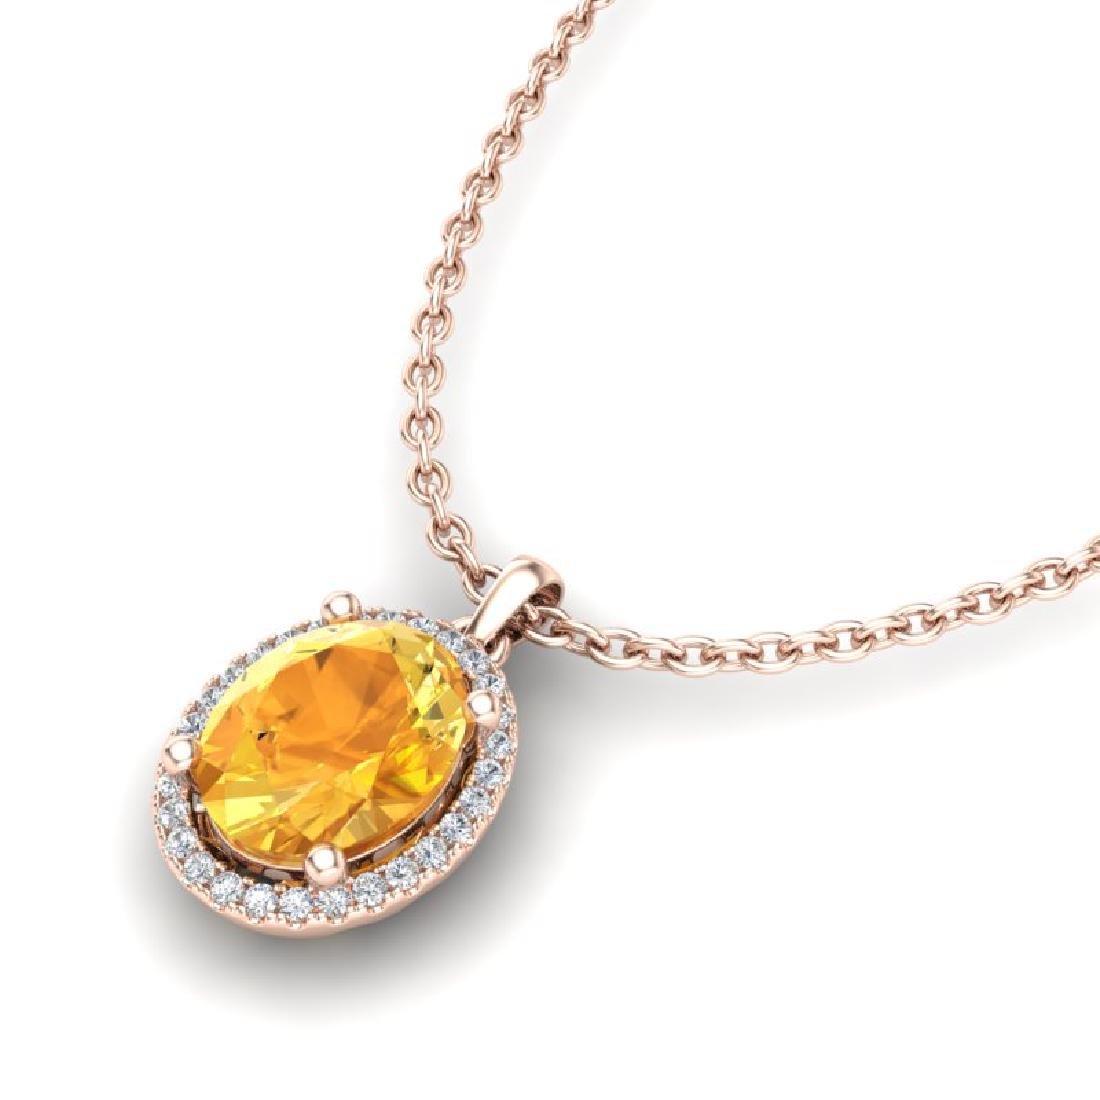 2.50 CTW Citrine & Micro Pave VS/SI Diamond Necklace